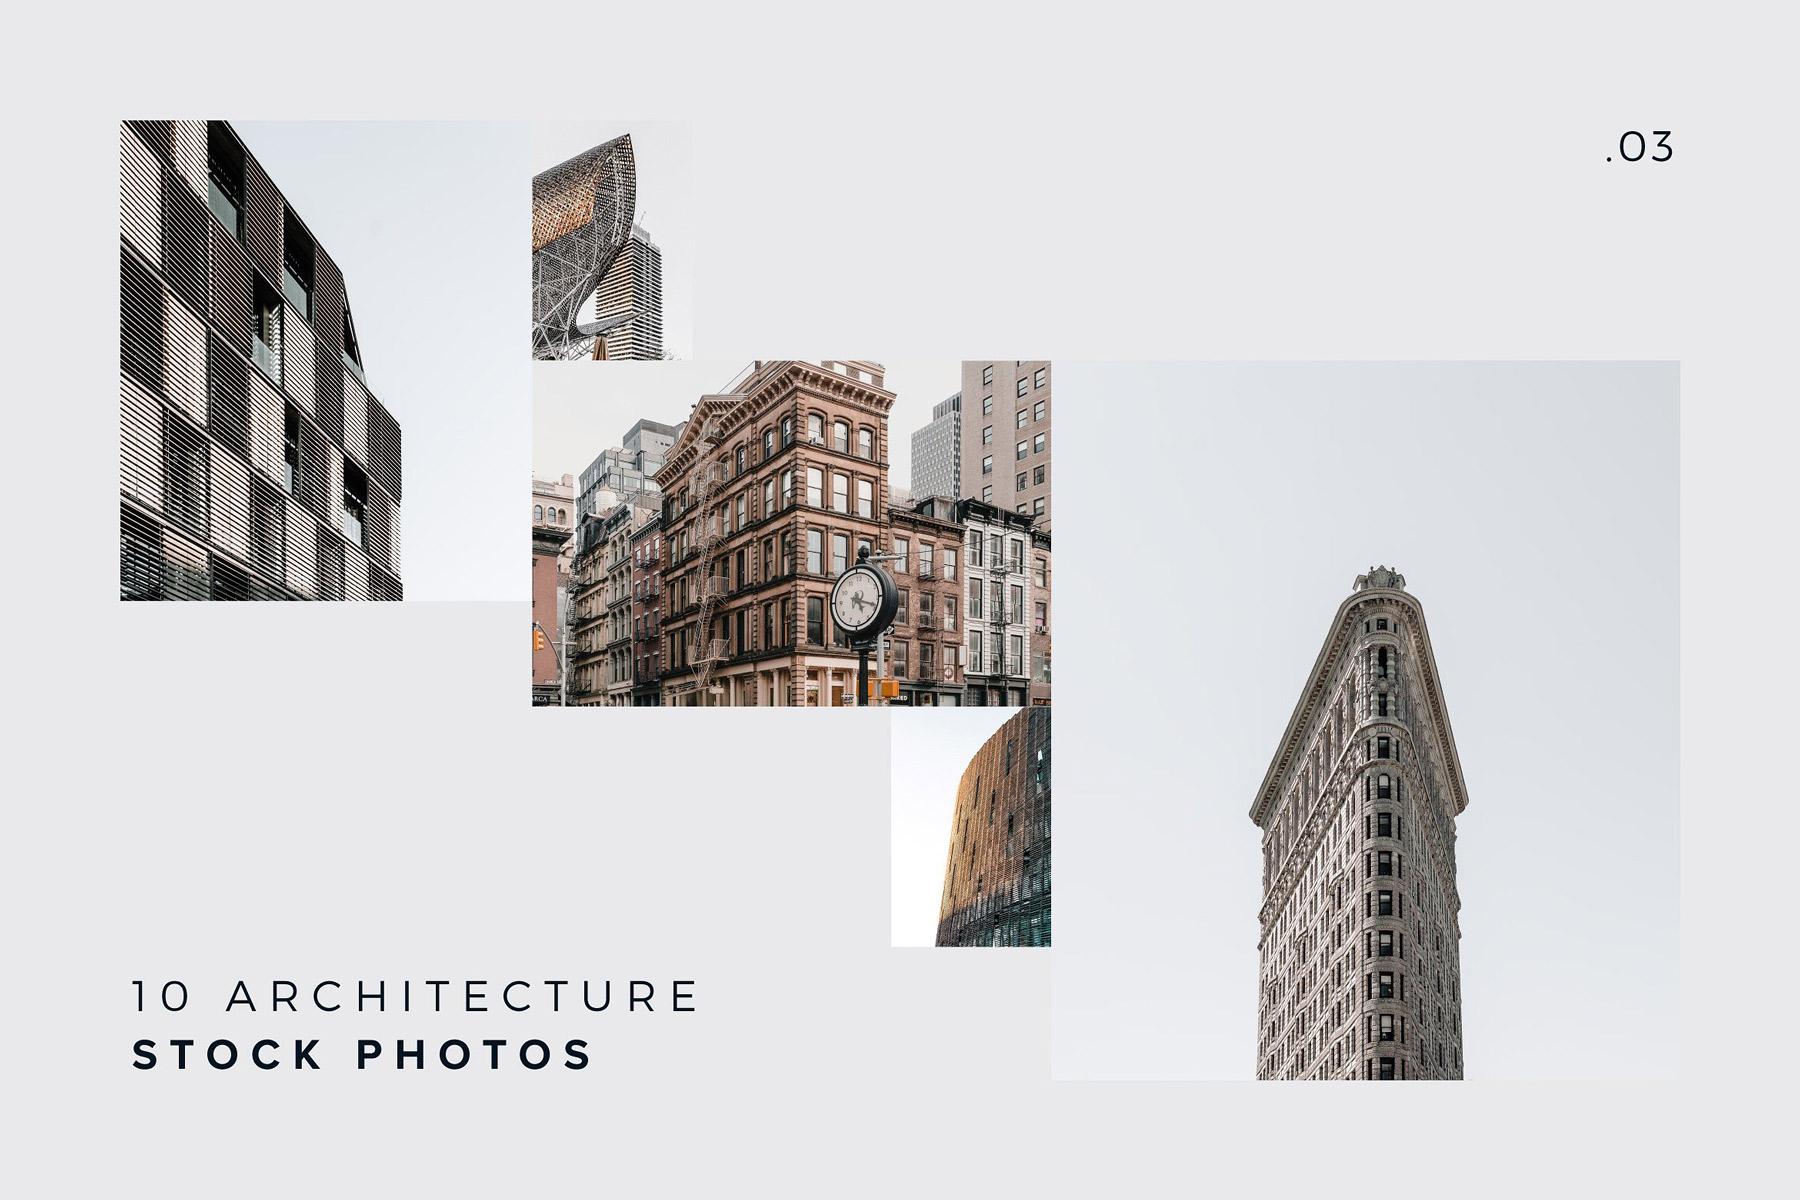 https://s3u.tmimgcdn.com/1658269-1544010448417_TM_10_architecture_photos_packvol.3_00-.jpg